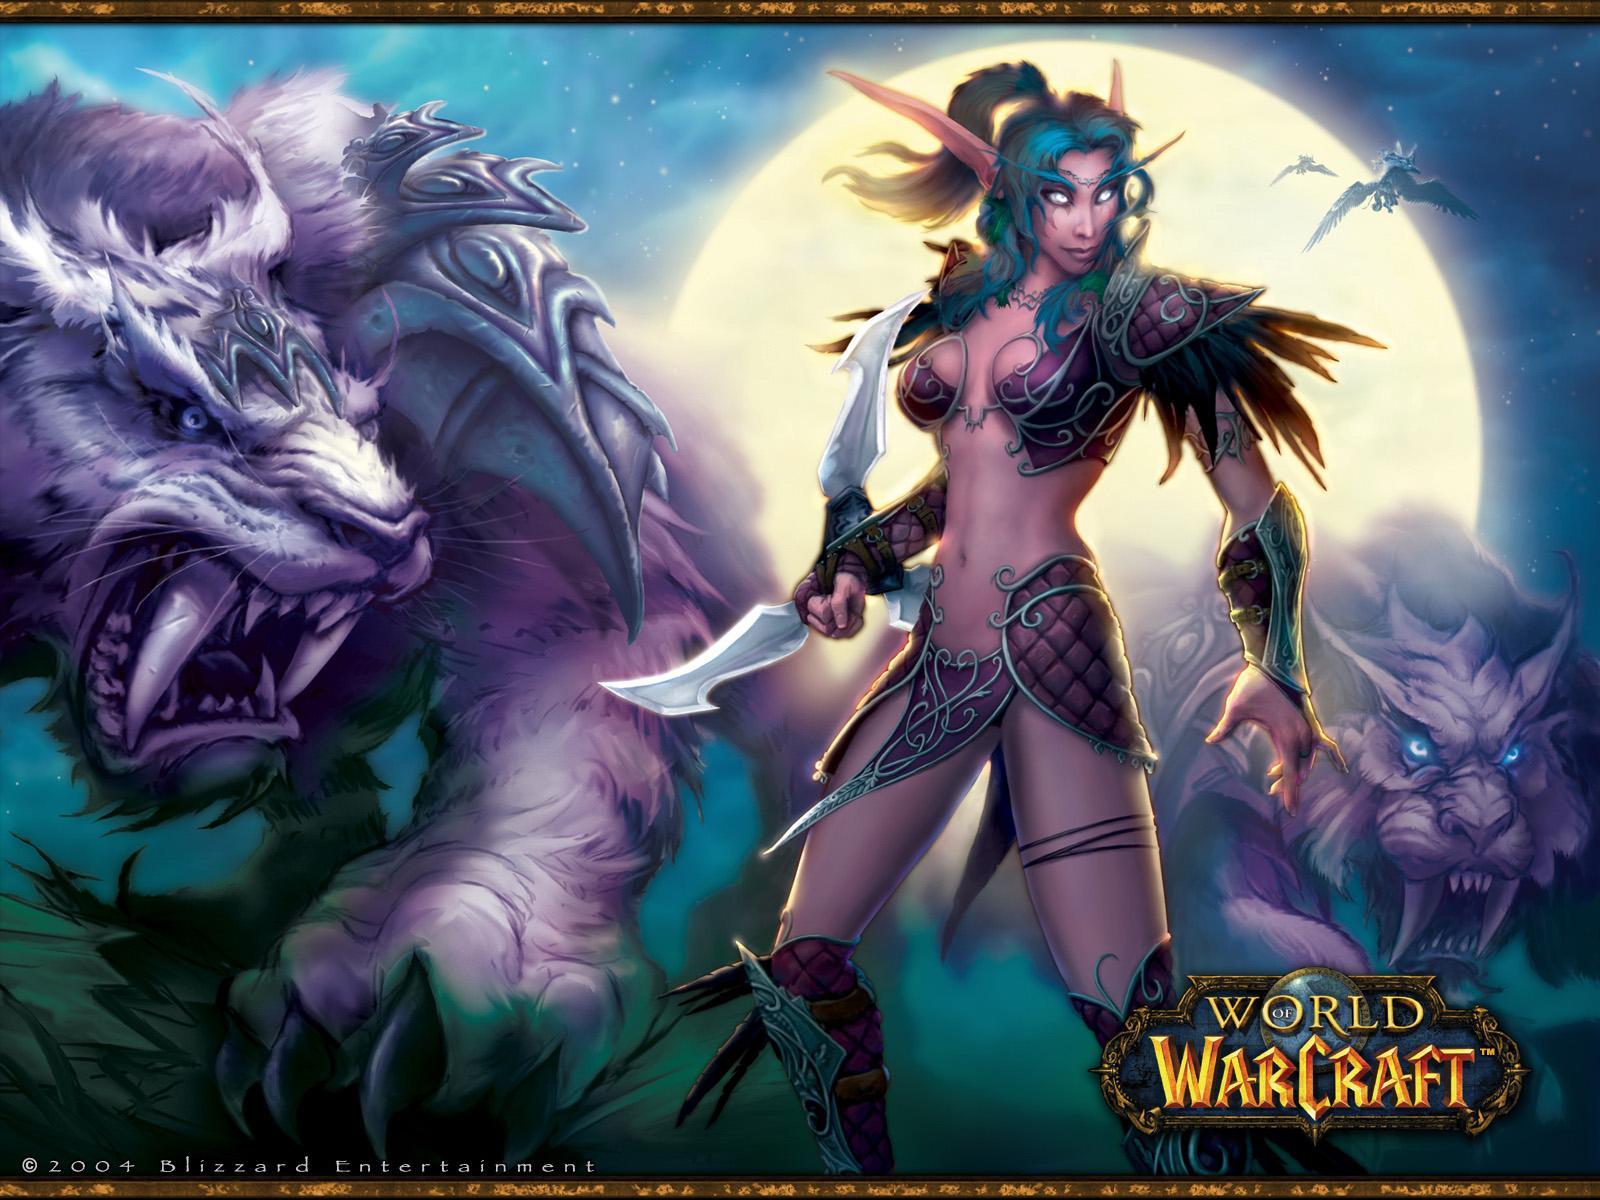 world_of_warcraft_89,Warcraft Wallpaper : The World Of Warcraft-warcraft wallpaper world of warcraft warcraft logo warcraft 3 warcraft 1